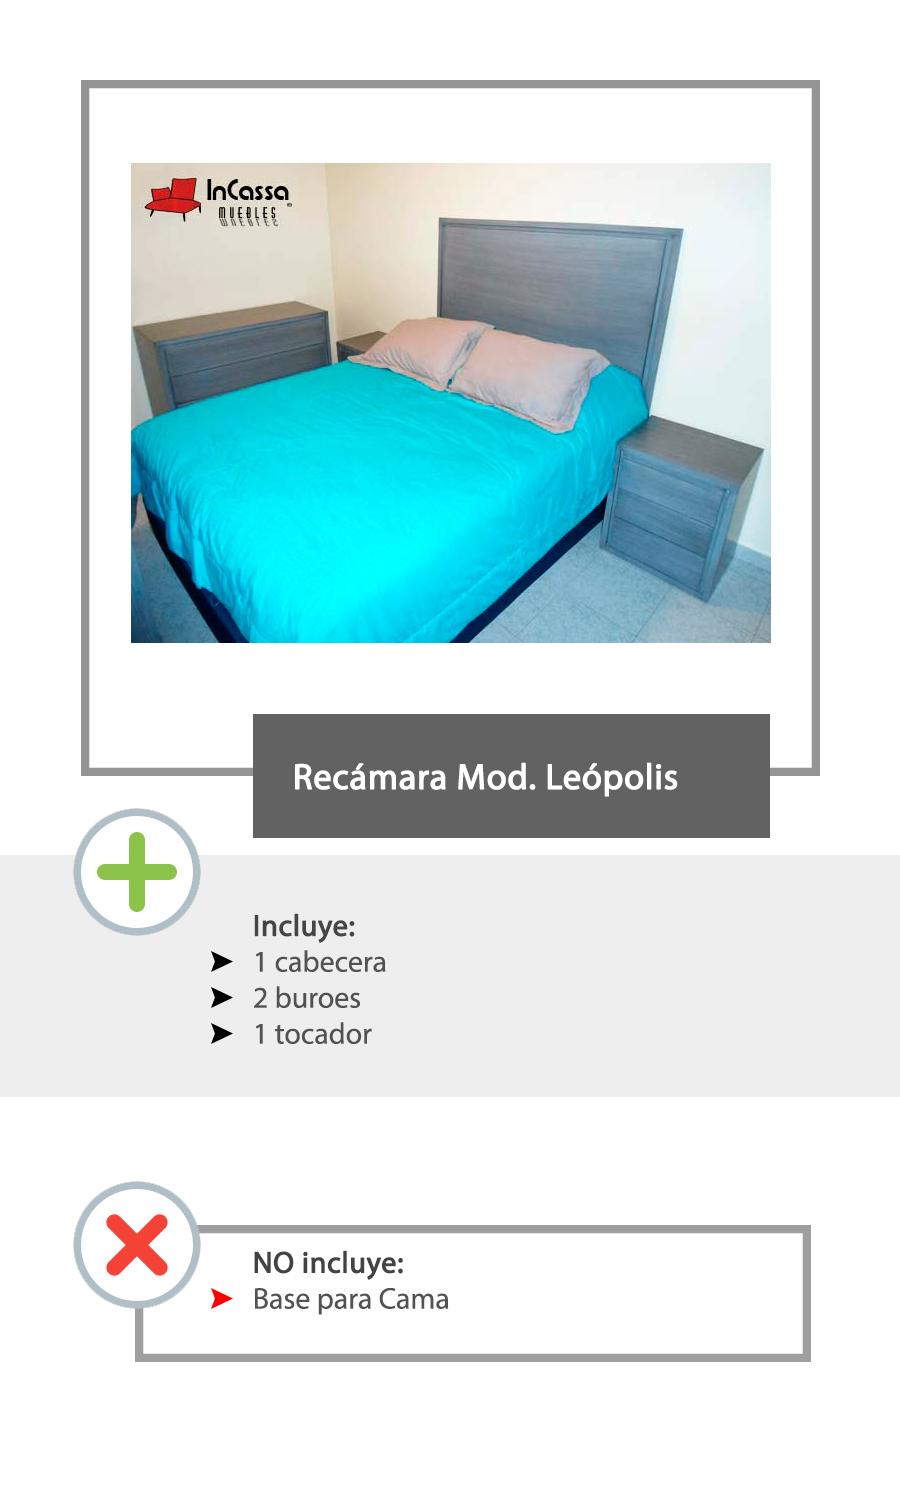 Recamara leopolis minimalista matrimonial buros cabecera for Precio recamara matrimonial